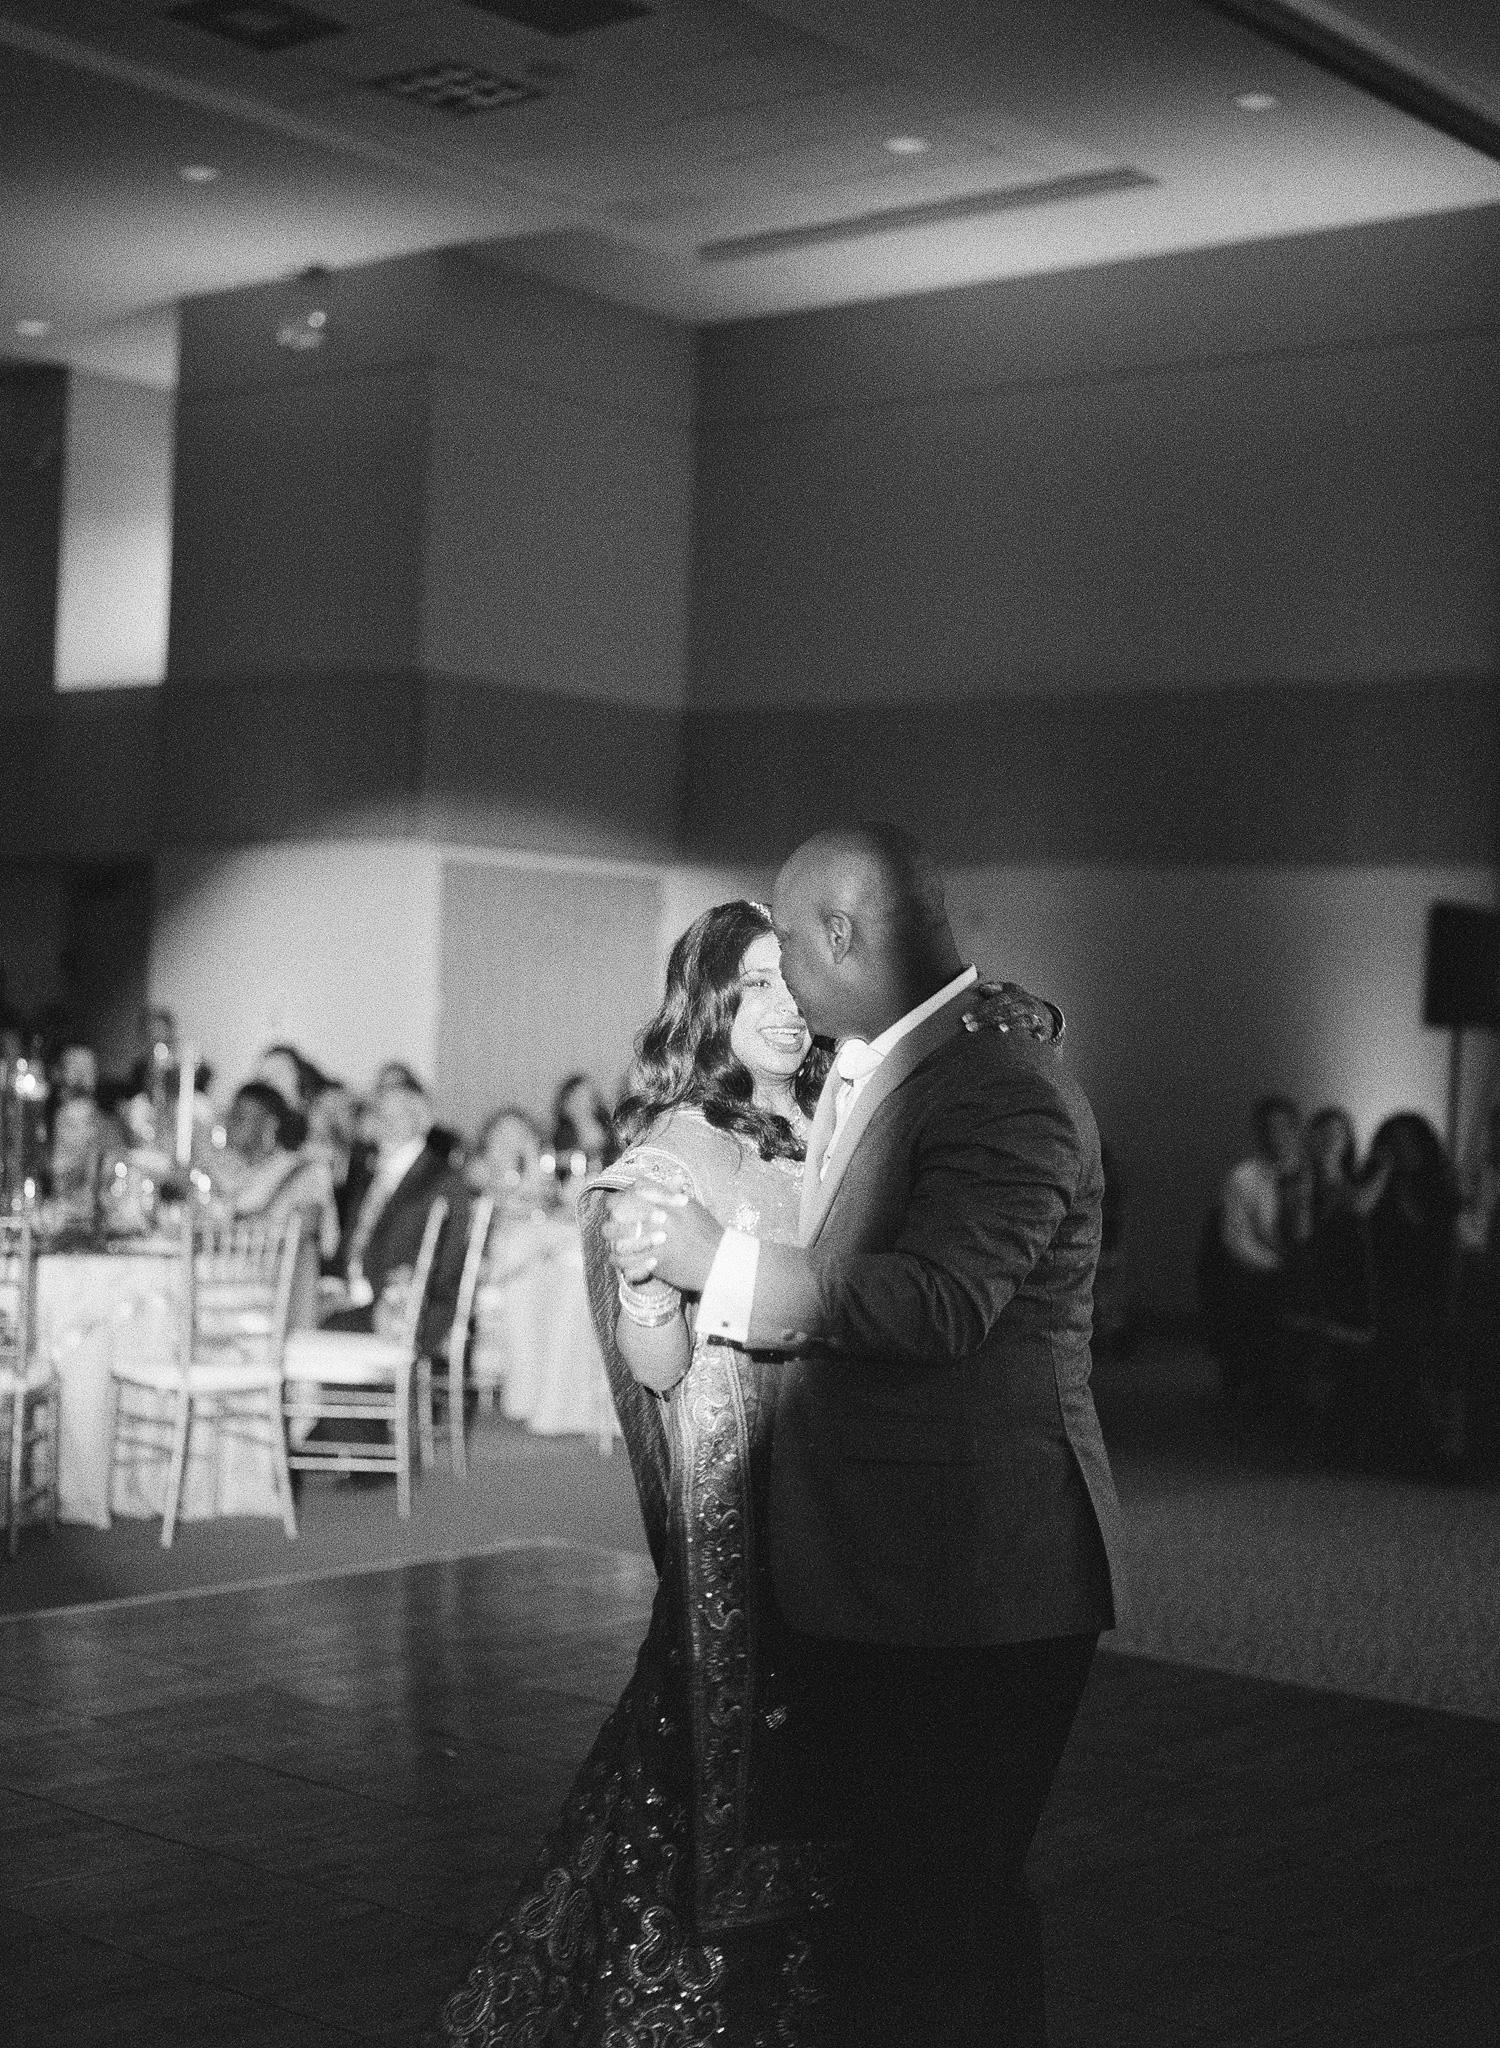 489-first-dance-indiain-wedding.jpg